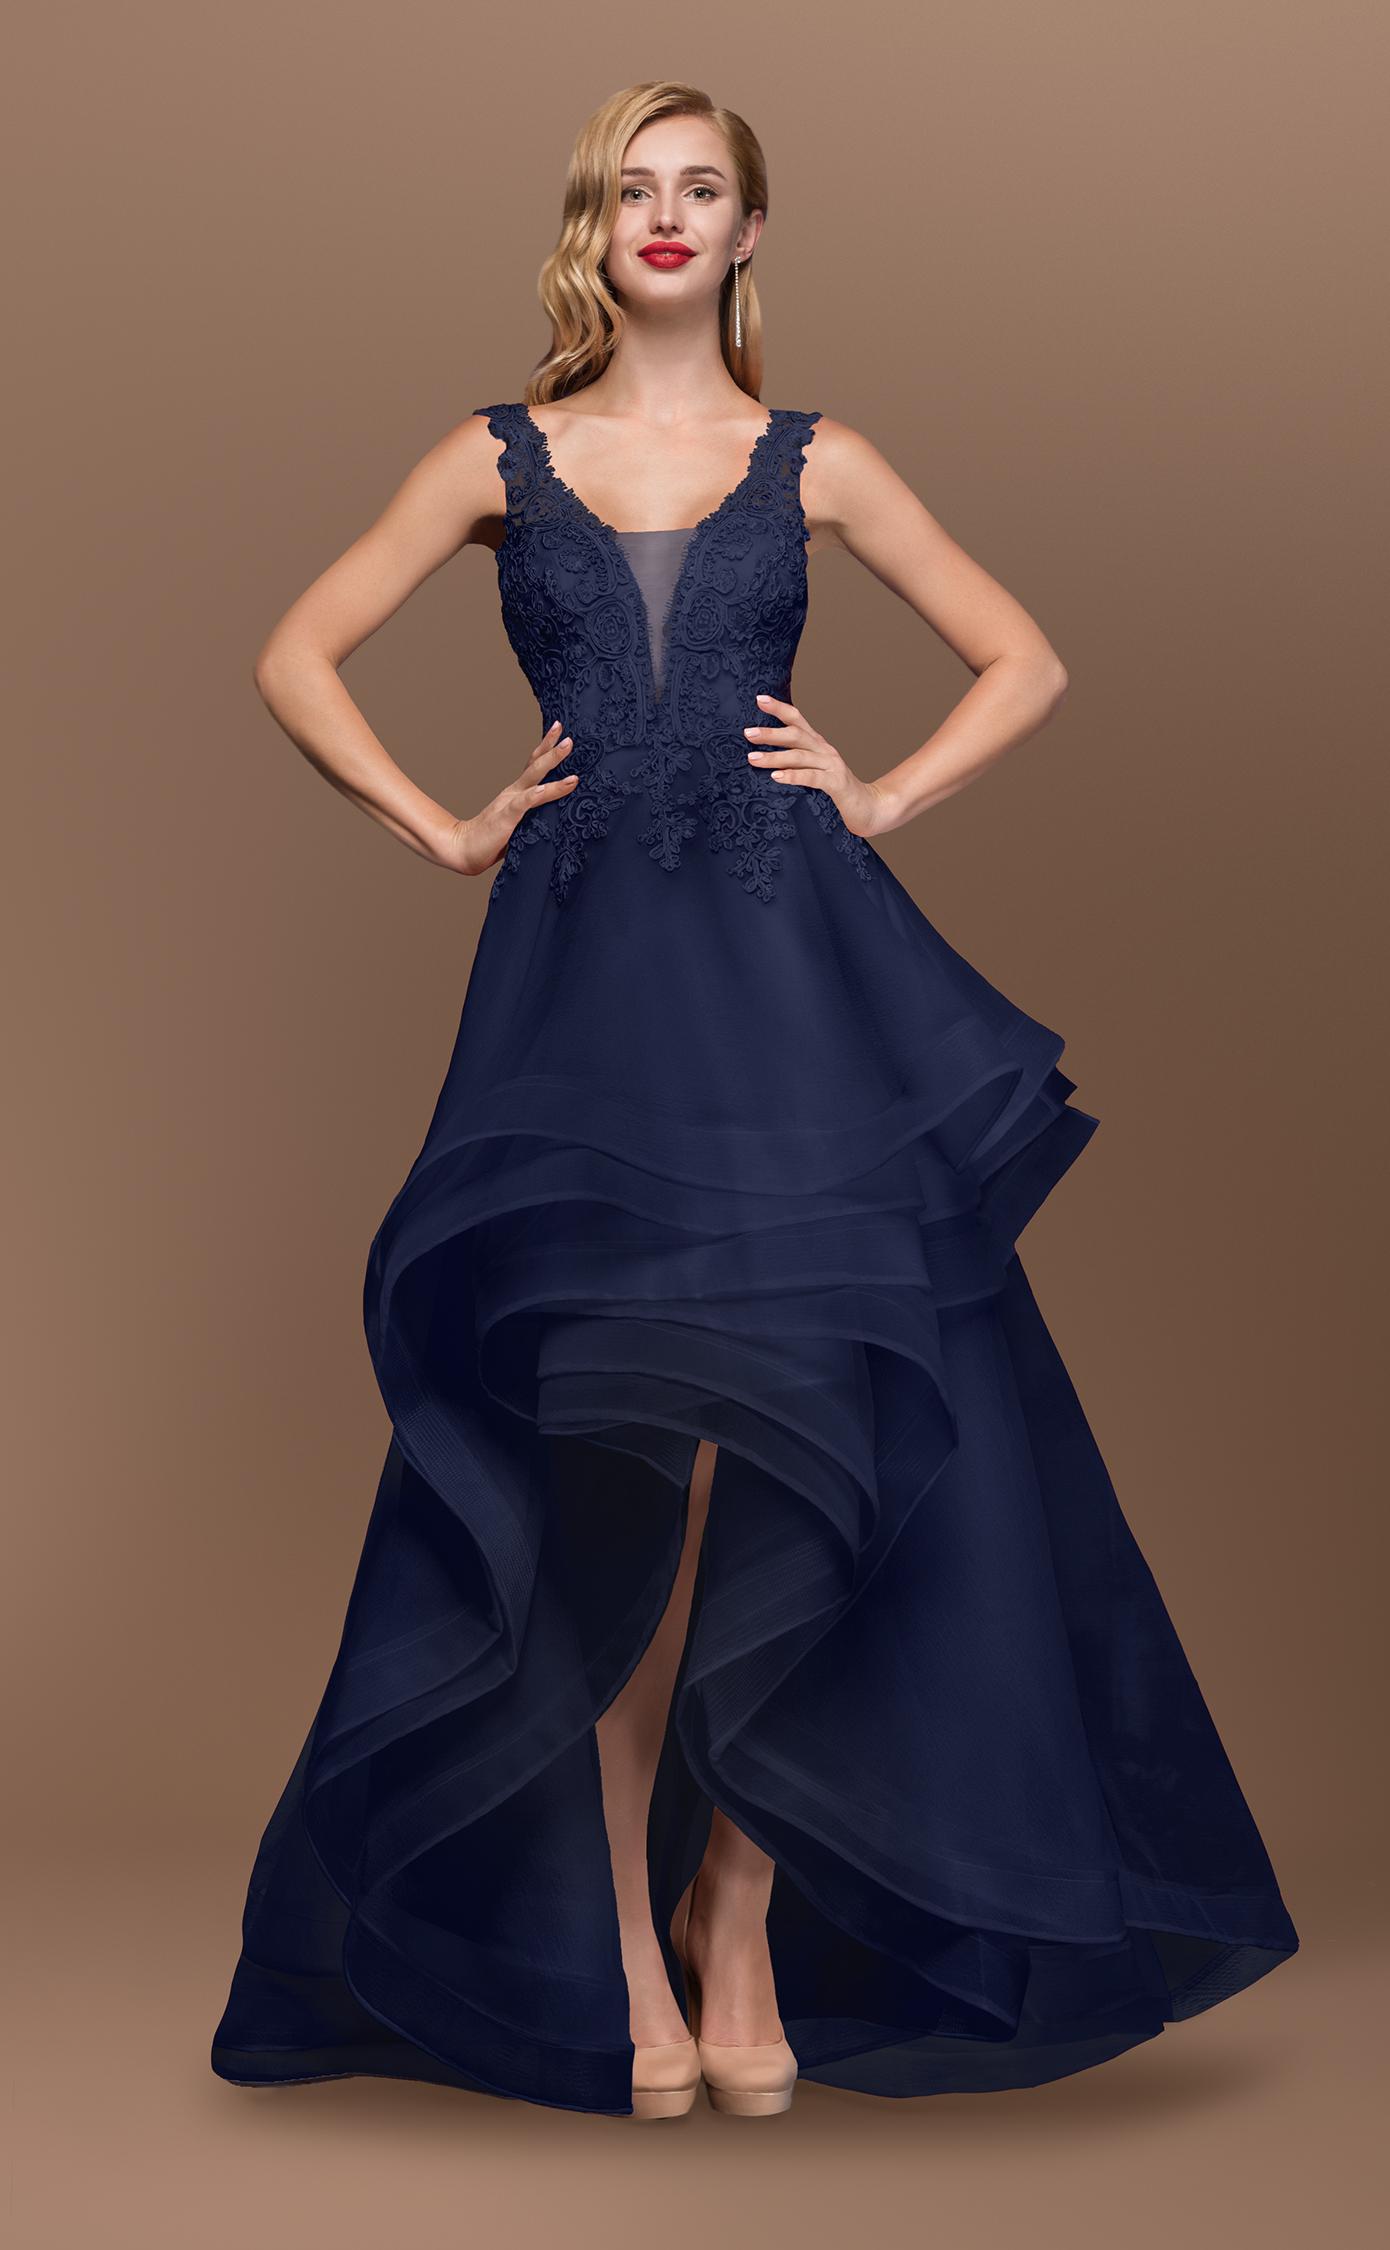 Blaues Ballkleid/Brautkleid | Samyra Fashion